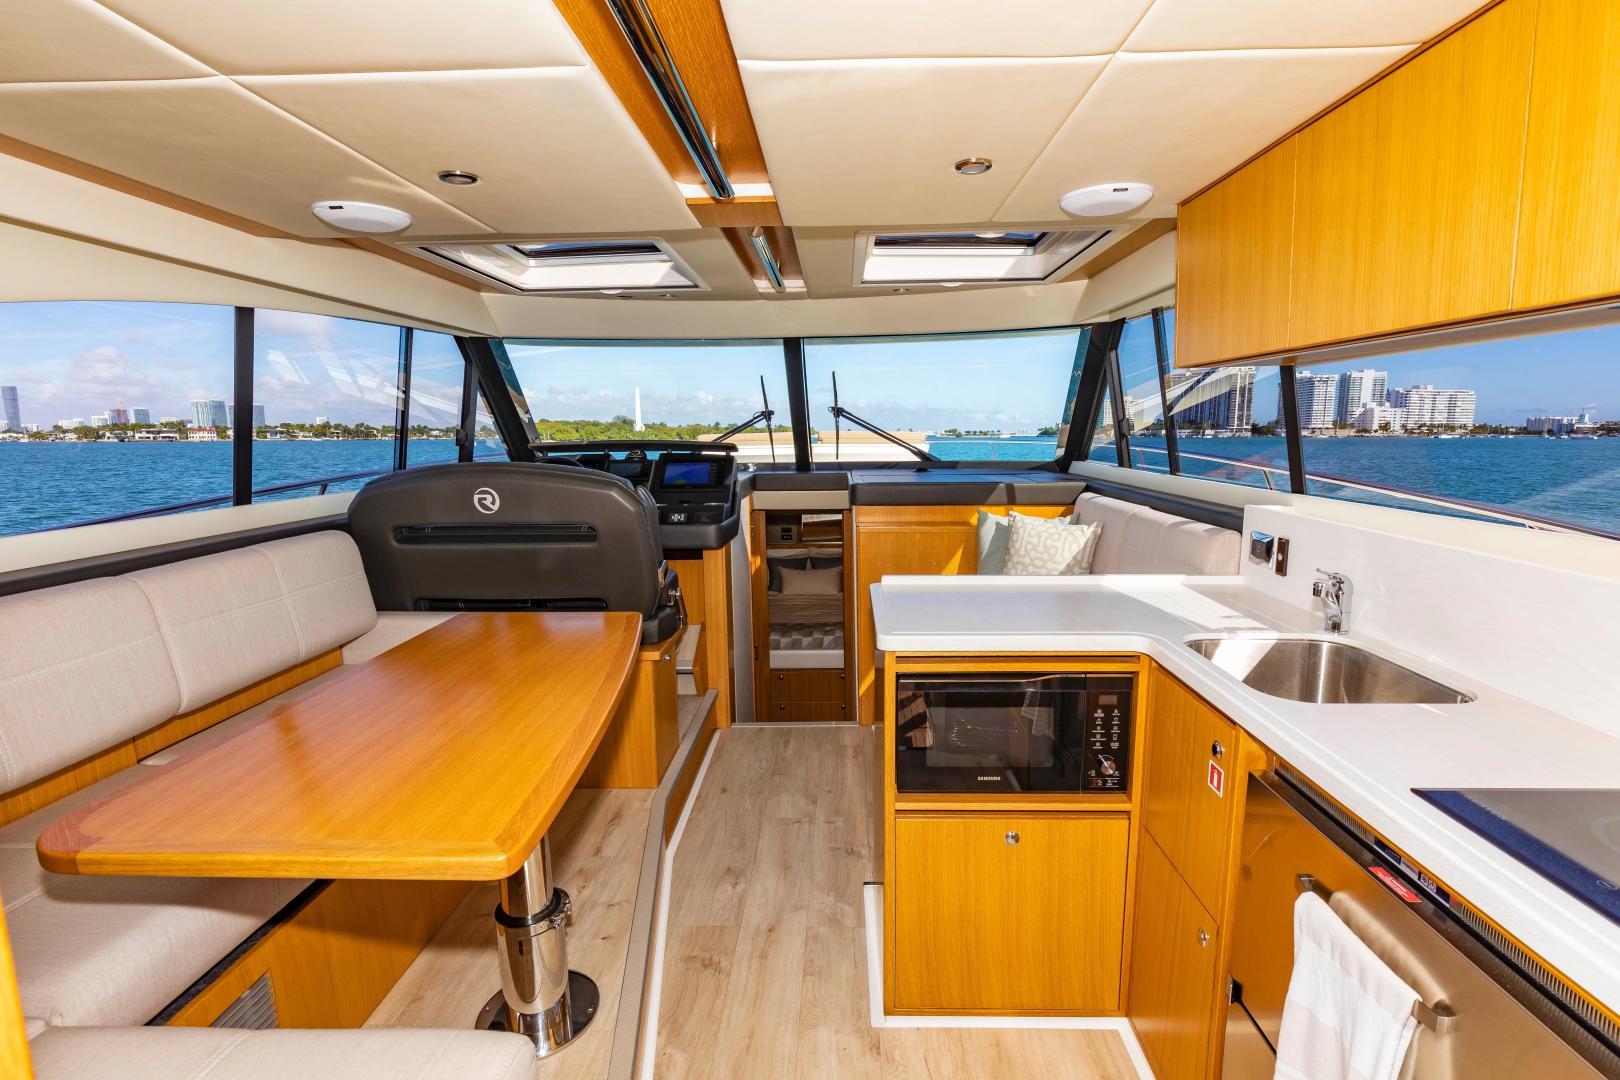 Riviera-395 SUV 2019-Ipanema Miami Beach-Florida-United States-1614896   Thumbnail